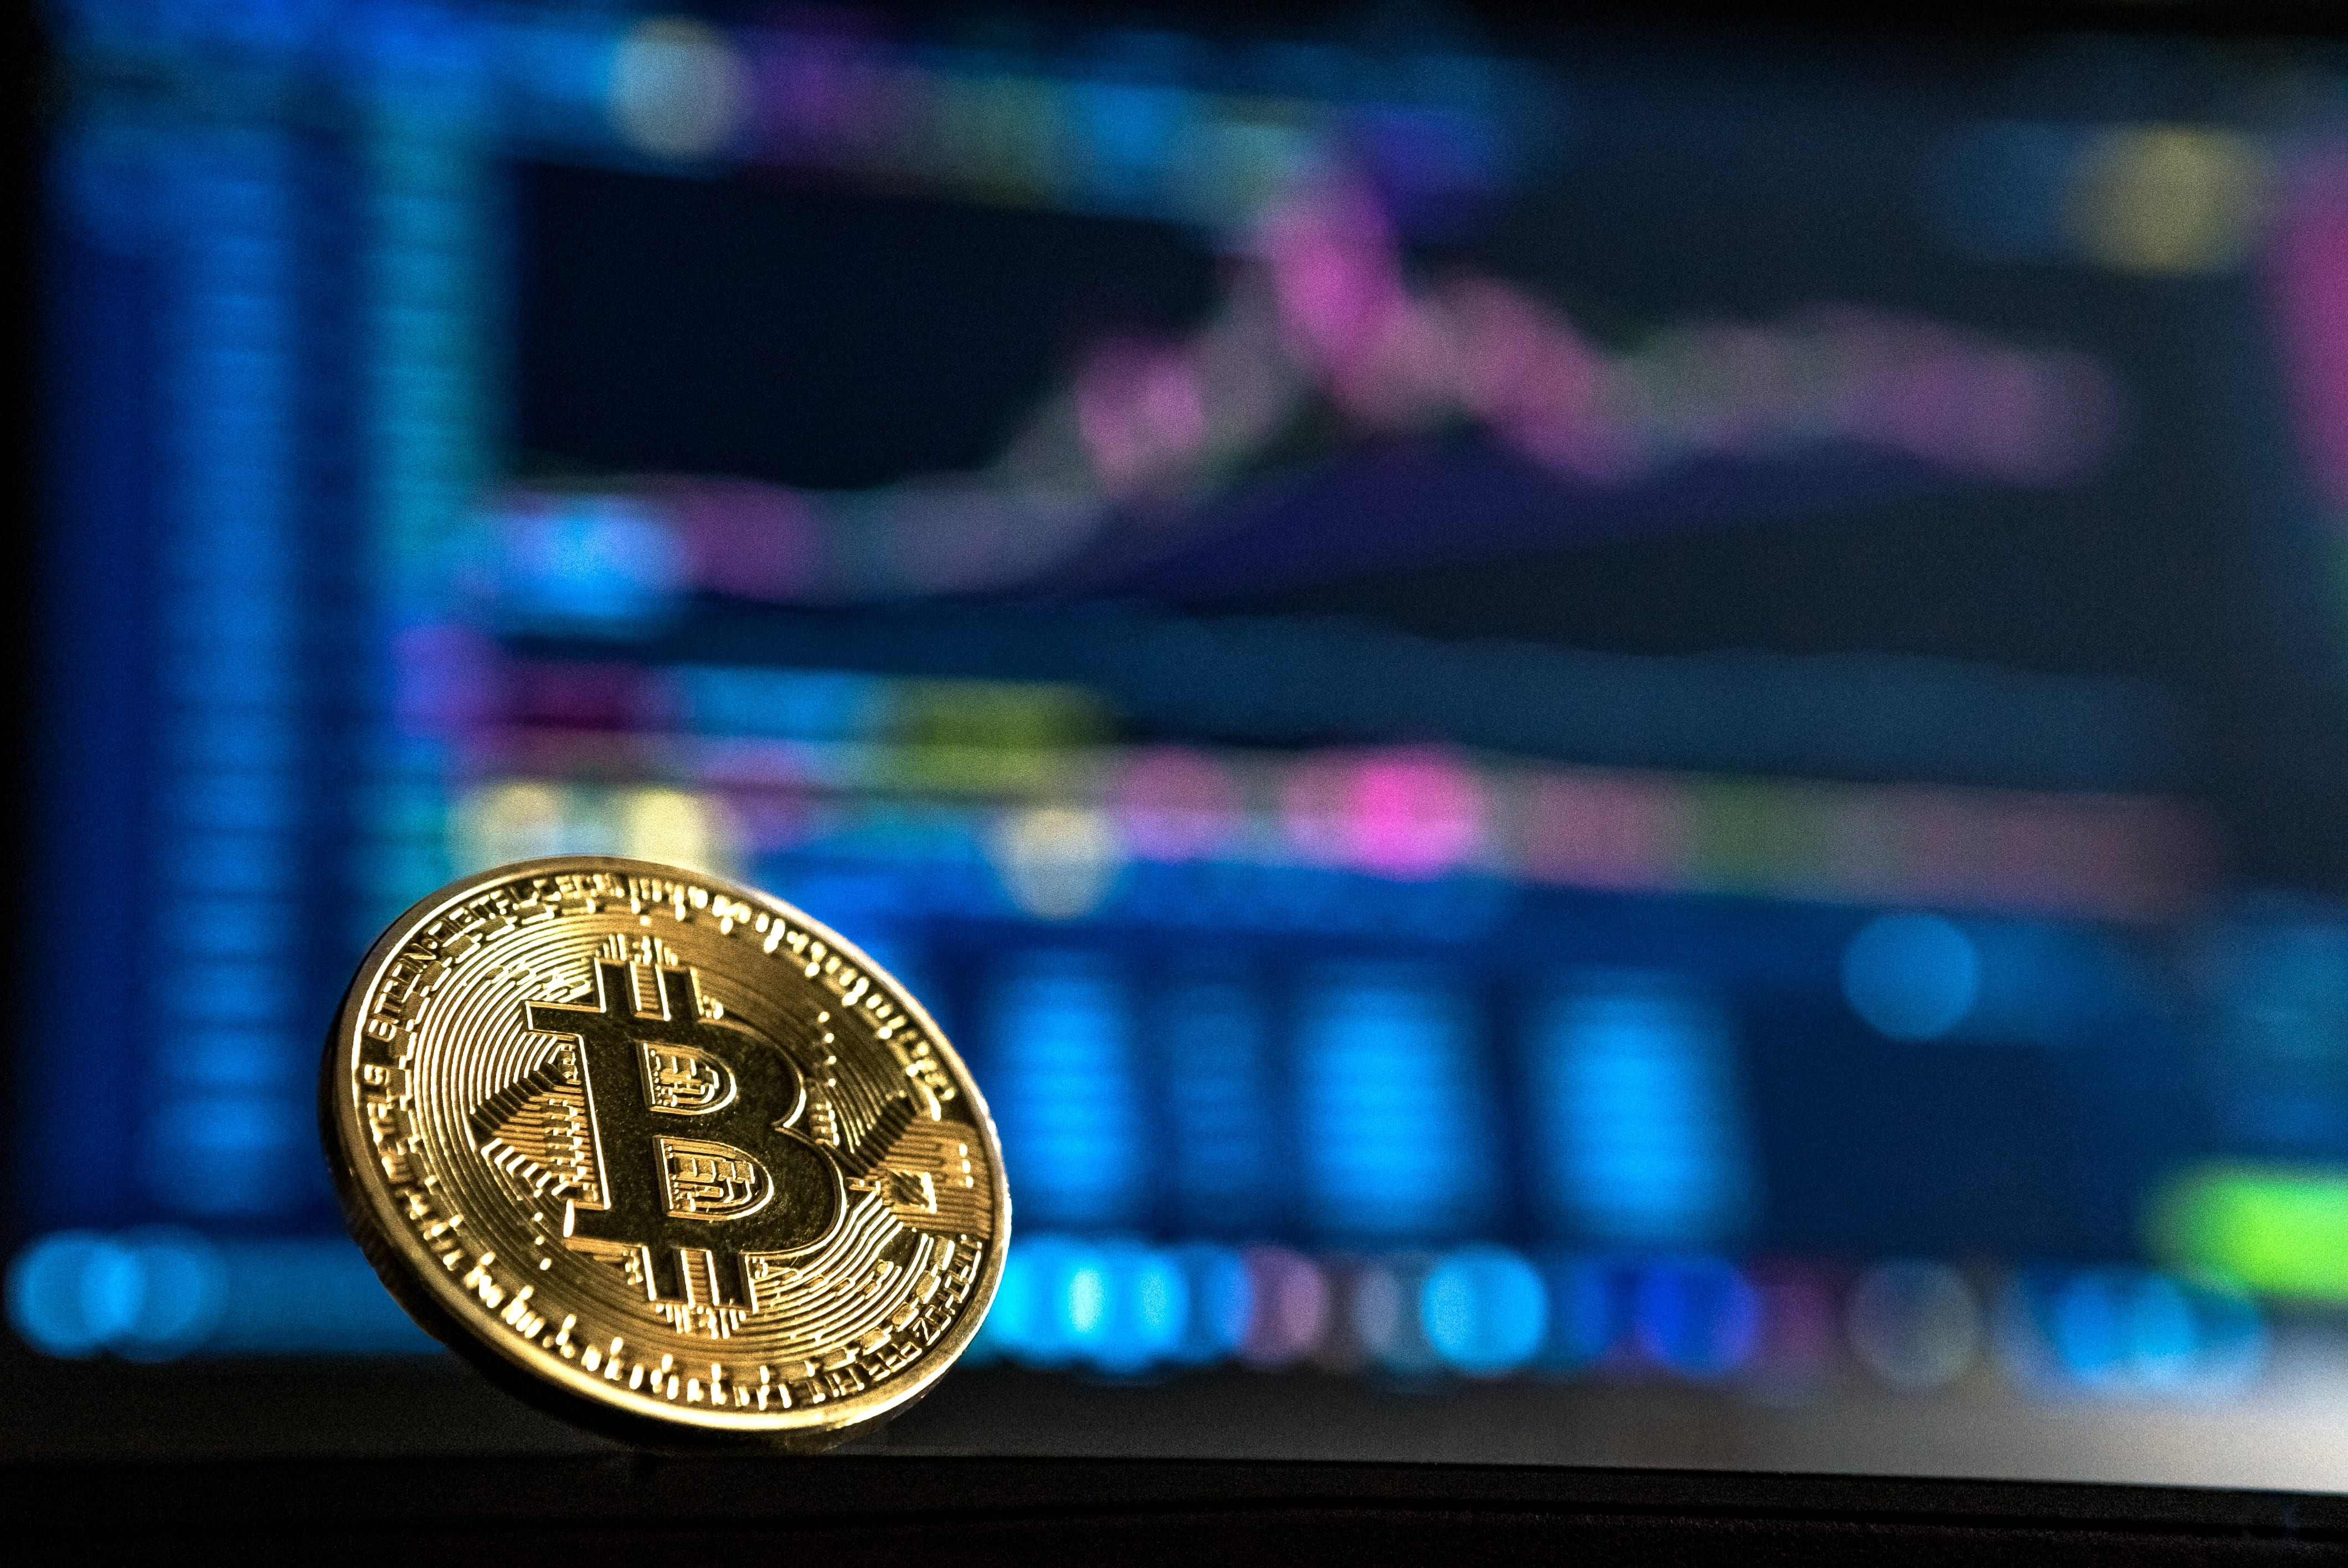 A gold bitcoin on a soft focus multi-colored background; image by André François McKenzie, via Unsplash.com.